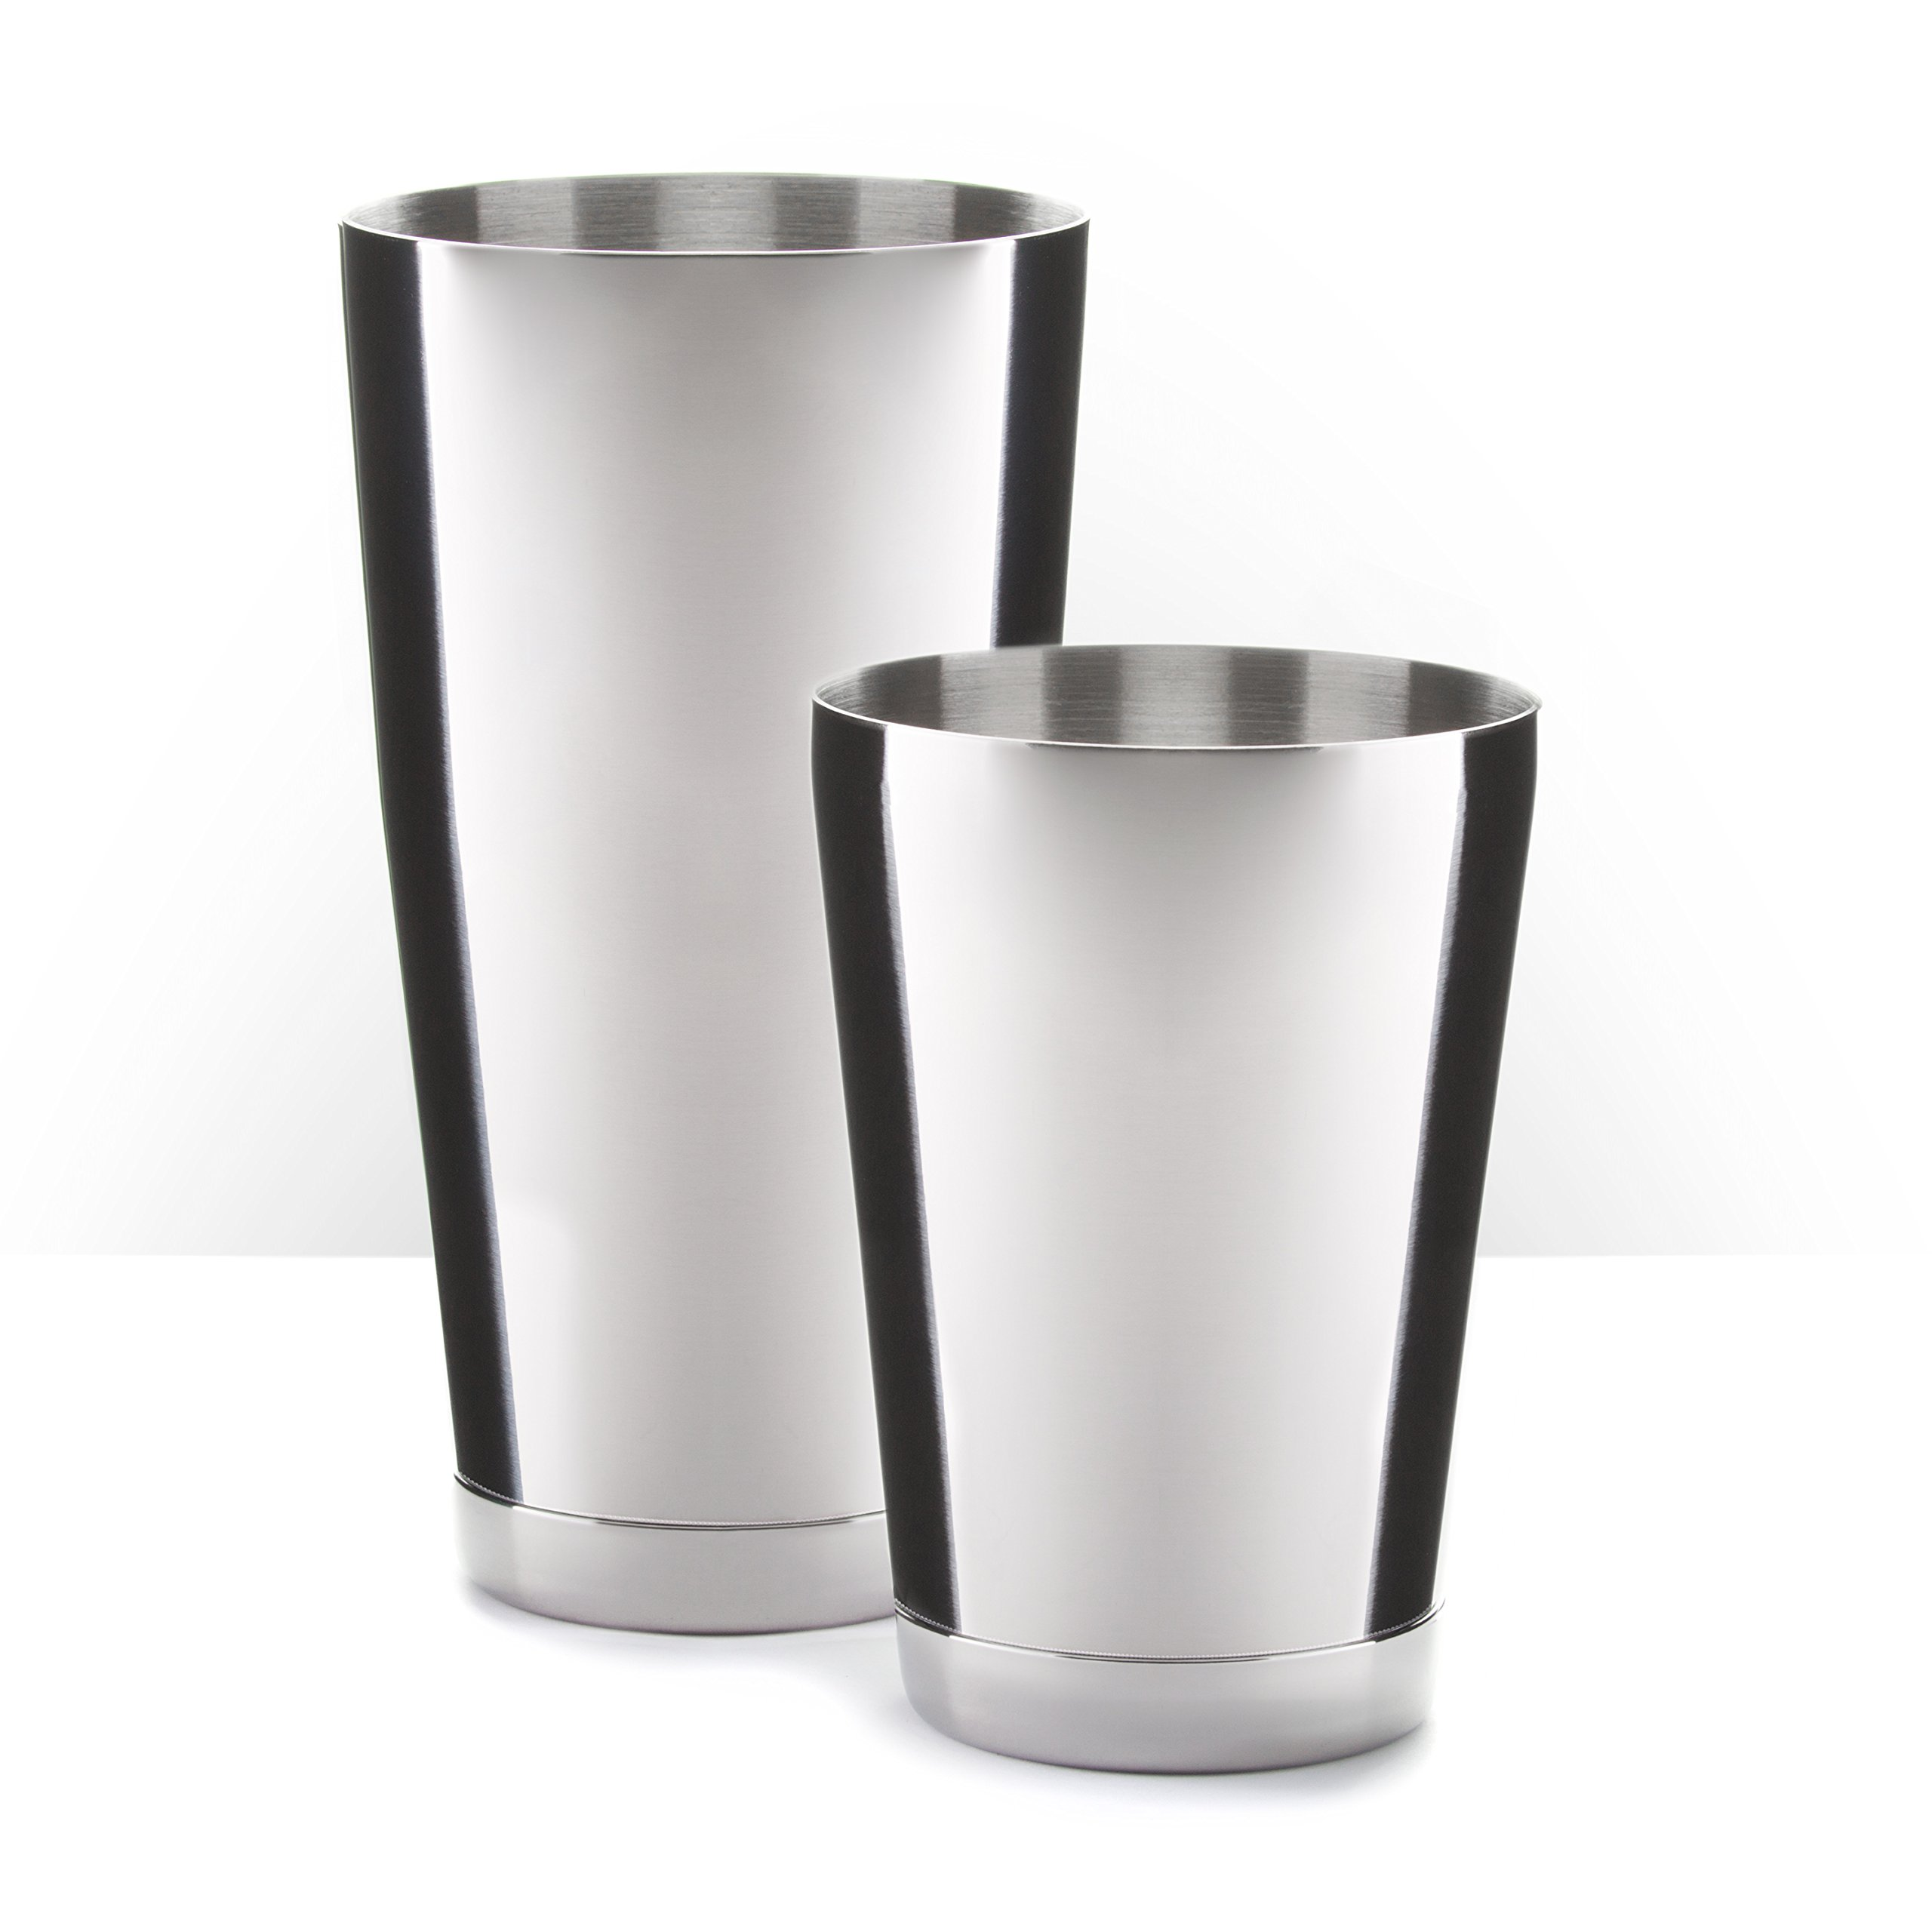 Piña Barware Stainless Steel Commercial Bar Boston Shaker Tin Set - 28oz. & 18oz.